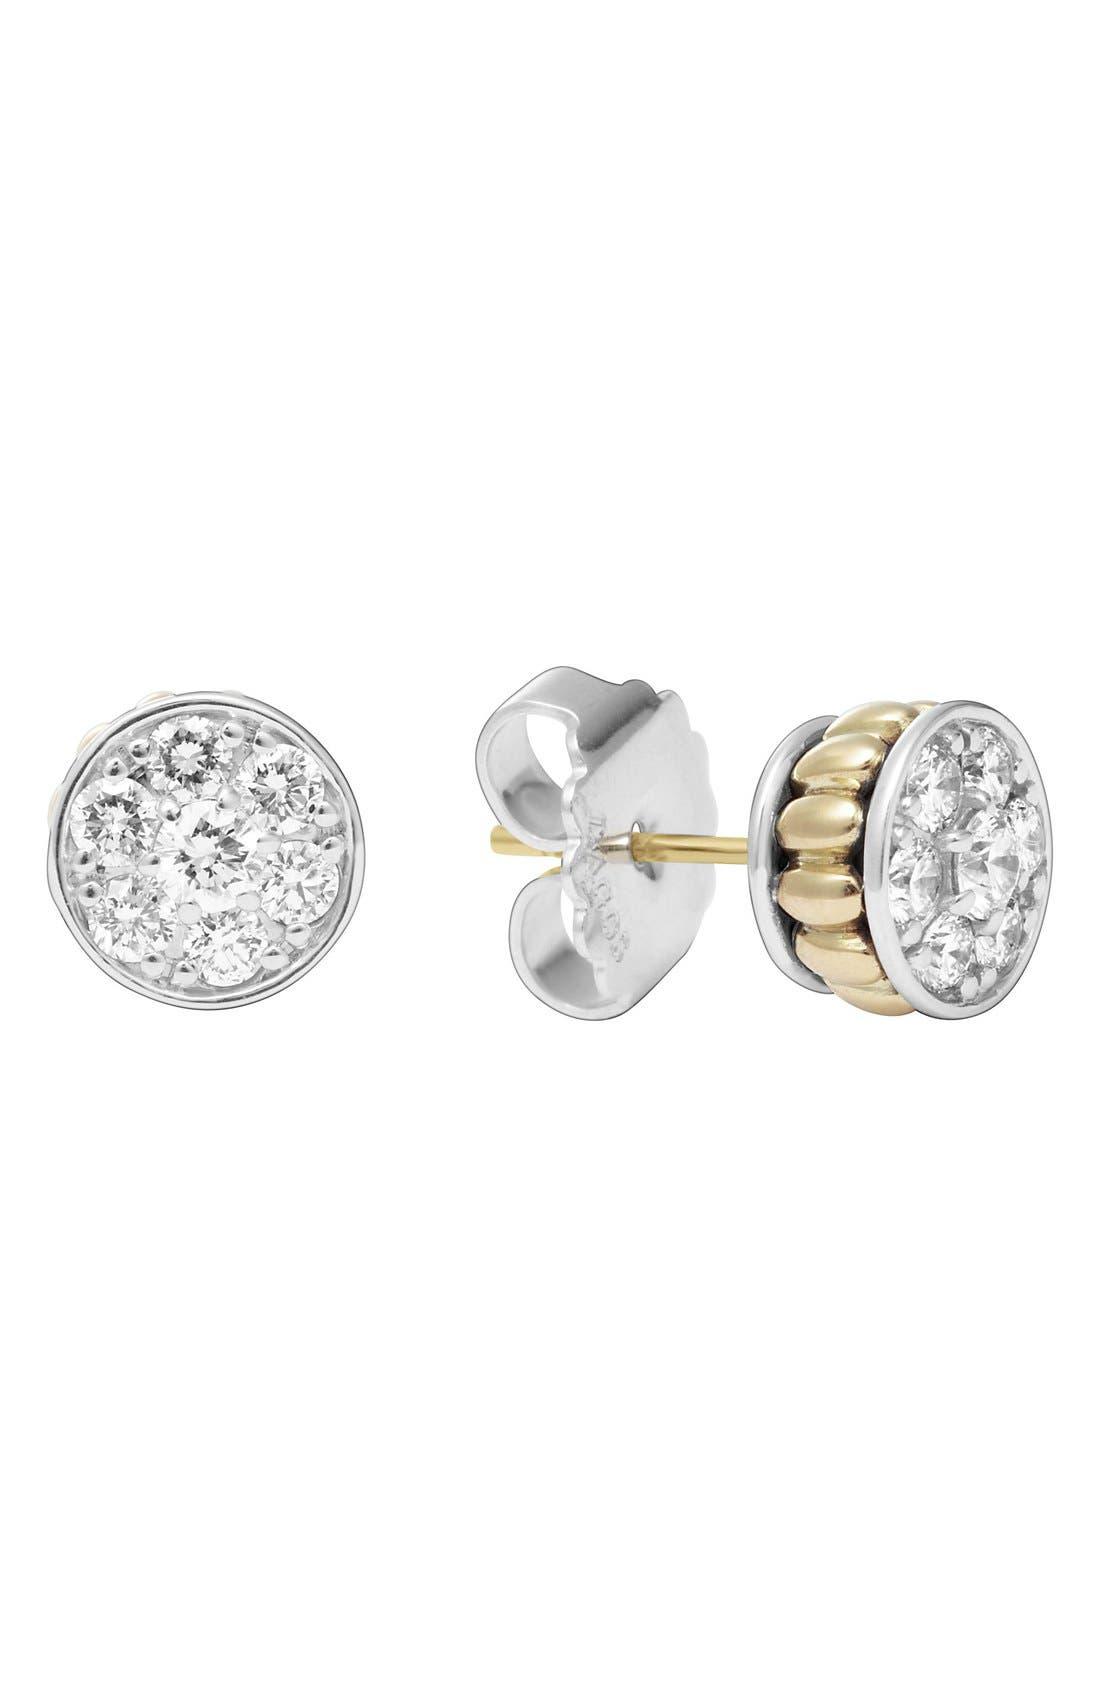 Diamond & Caviar Stud Earrings,                             Main thumbnail 1, color,                             Silver/ Gold